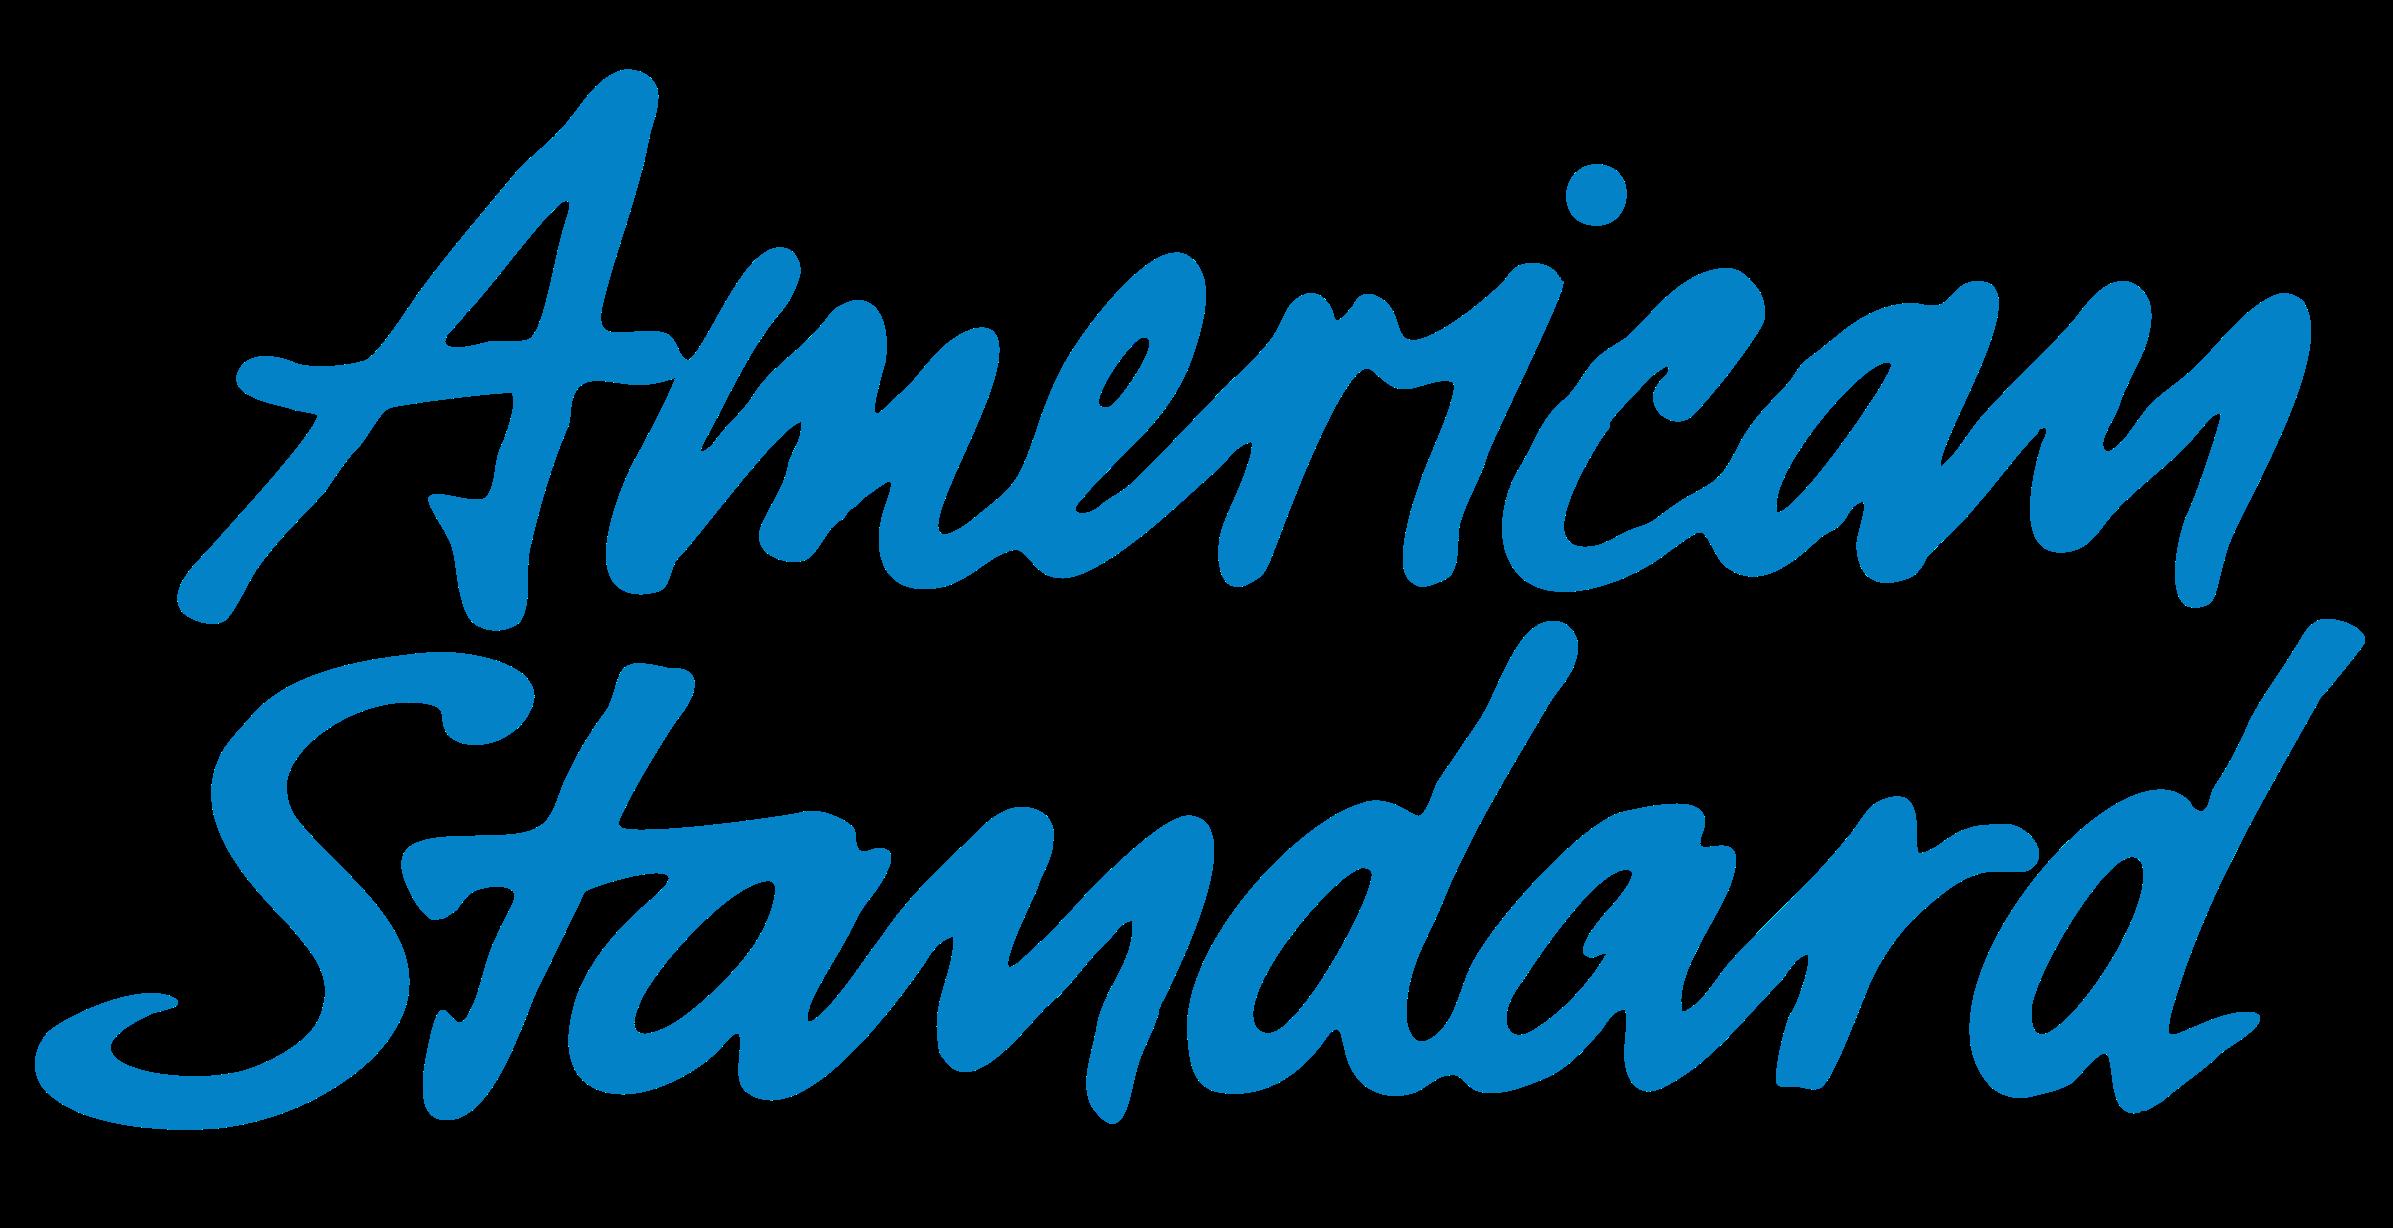 american-standard-02-logo-png-transparen